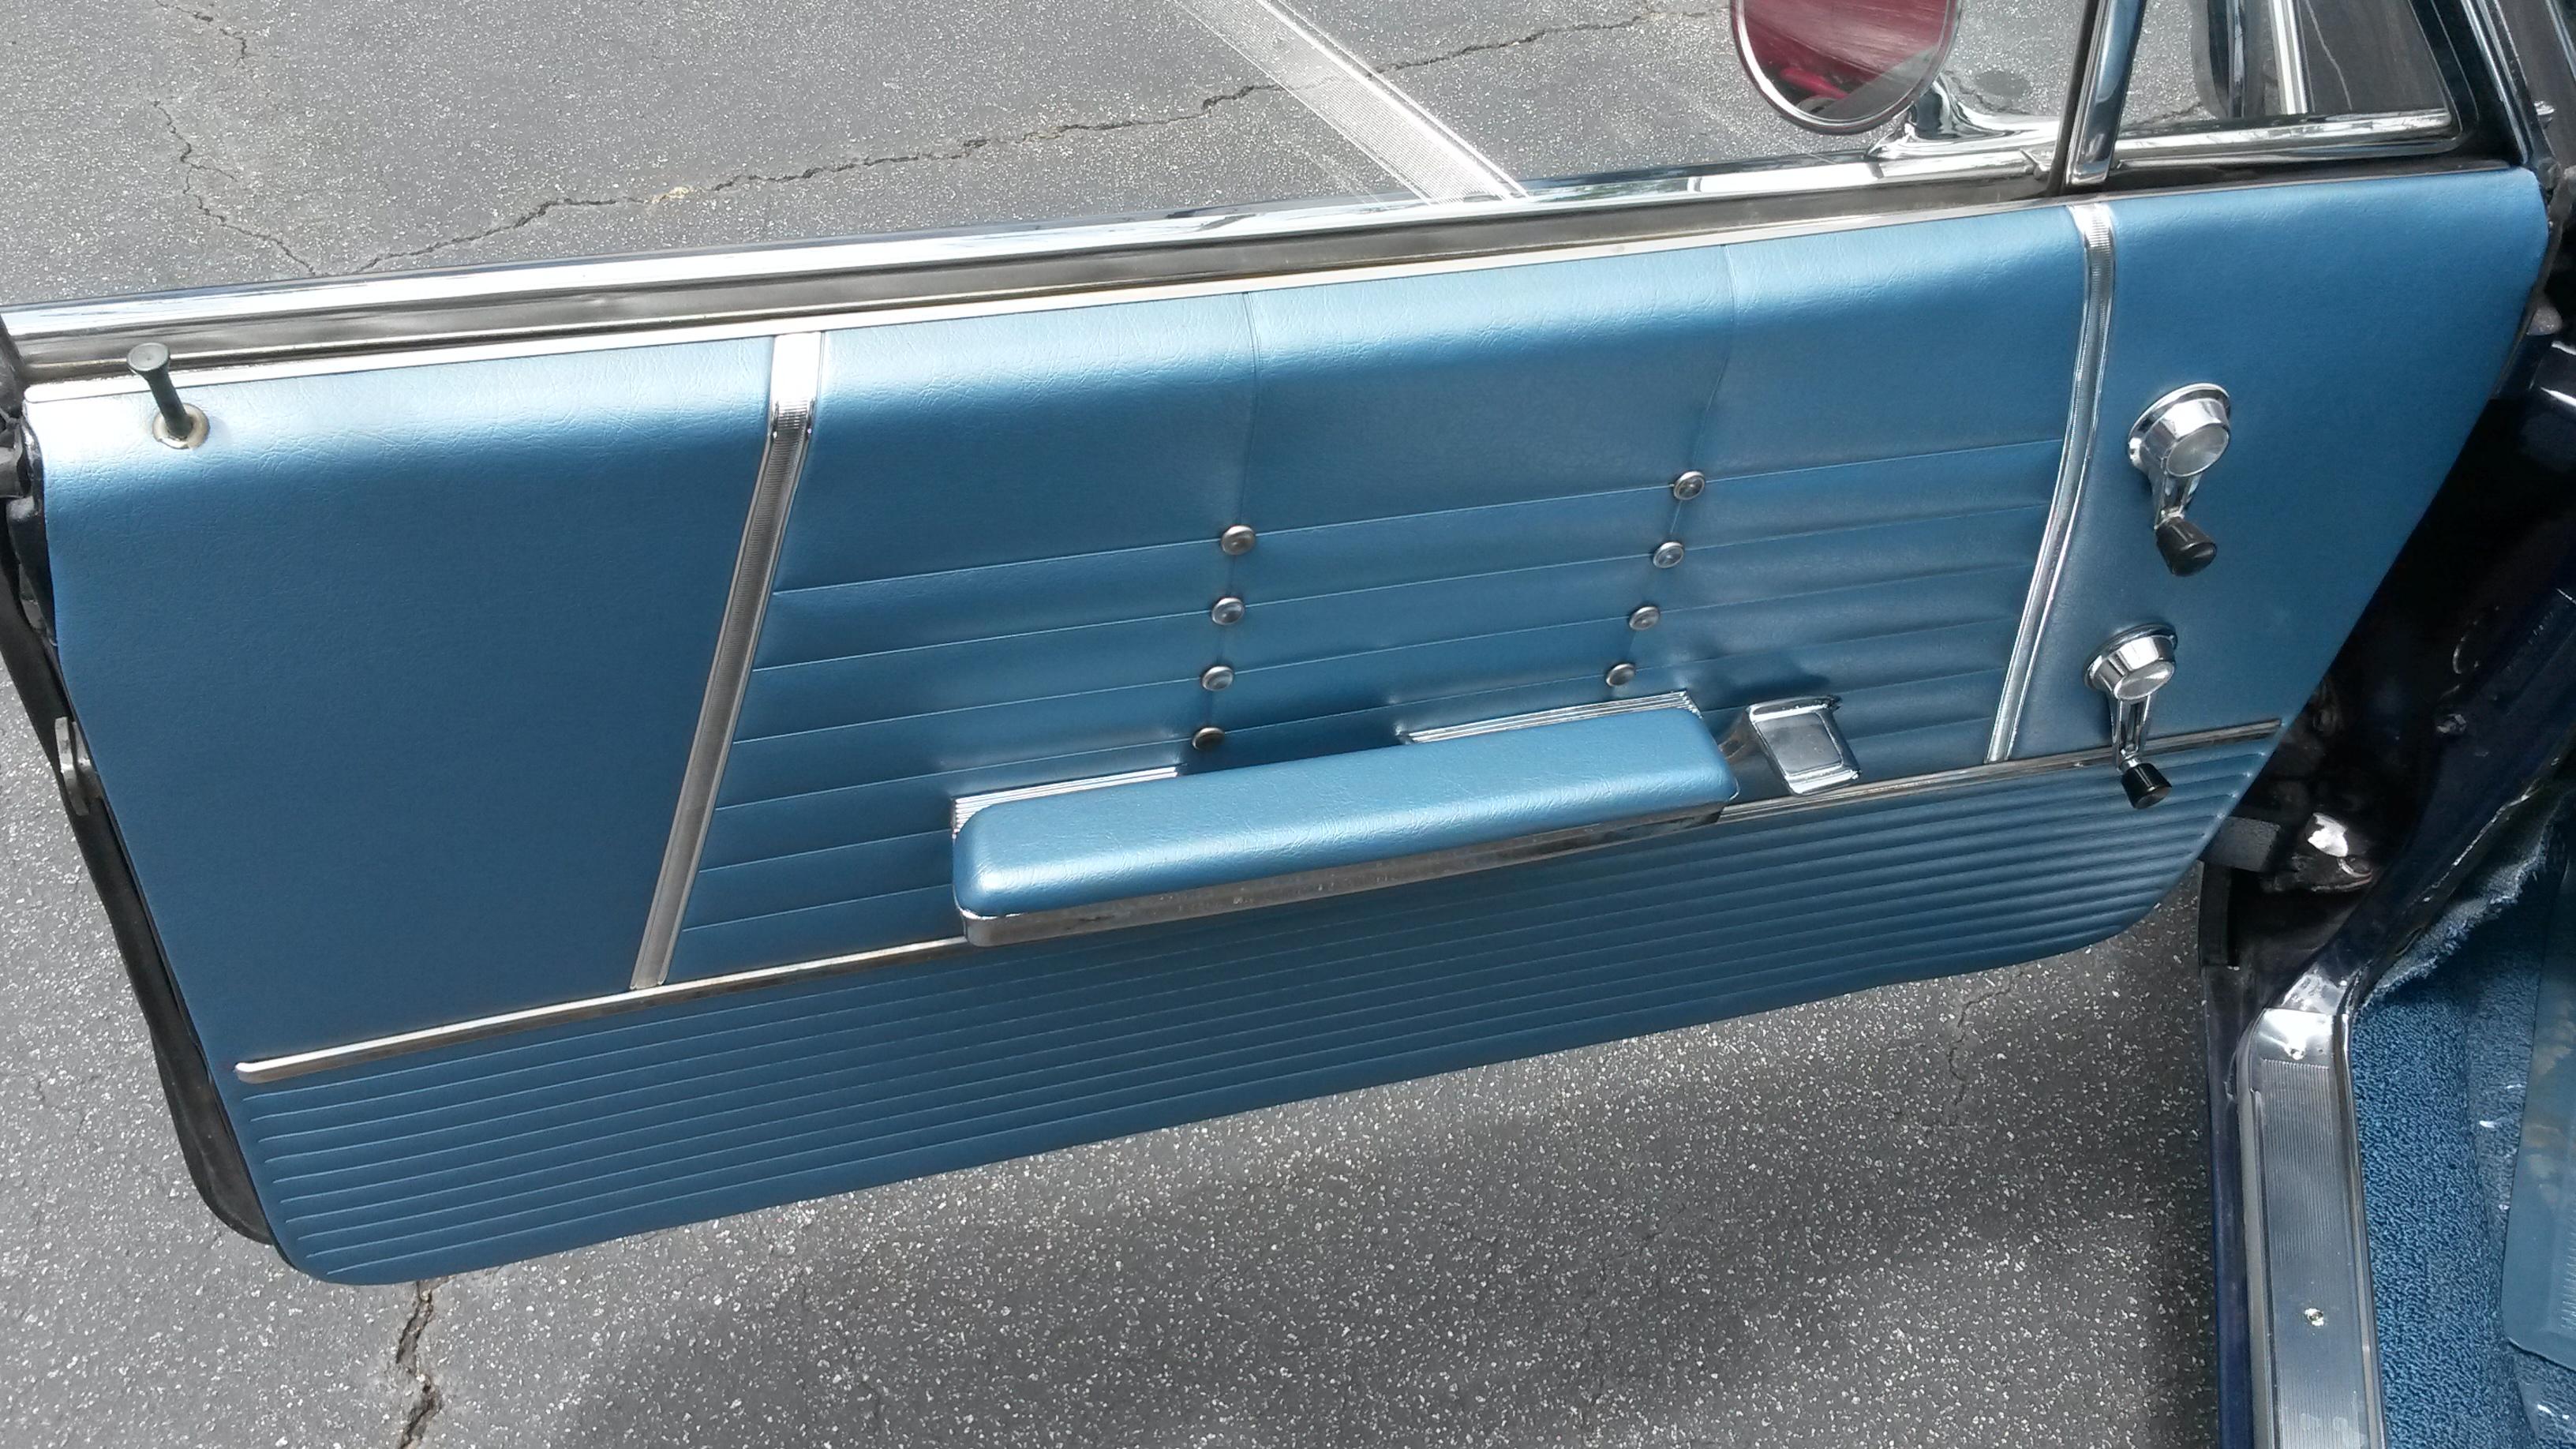 1964 Impala Two Door Hardtop (17)